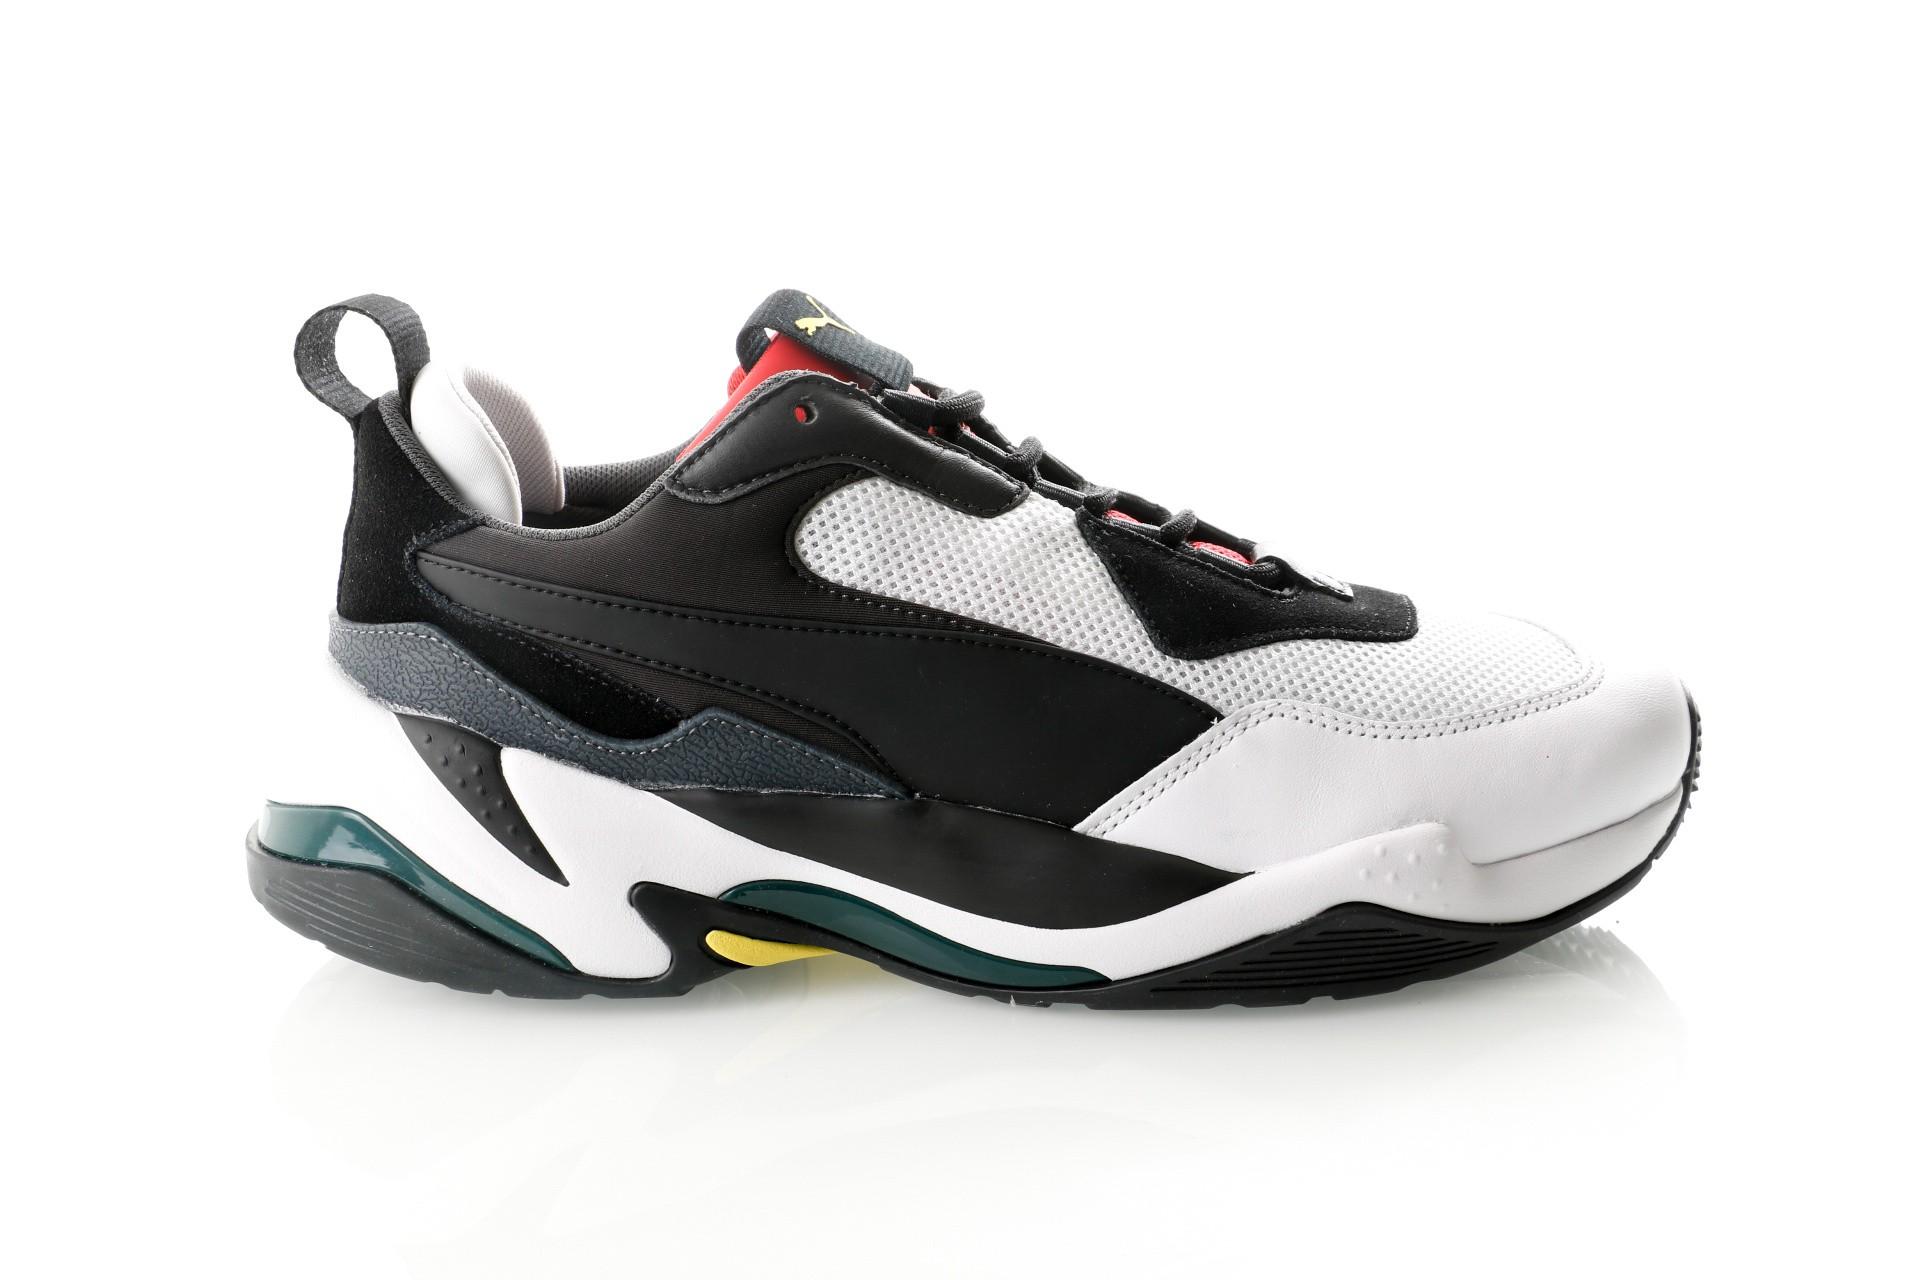 Foto van Puma Thunder Spectra 367516 Sneakers Puma Black-High Risk Red Januari